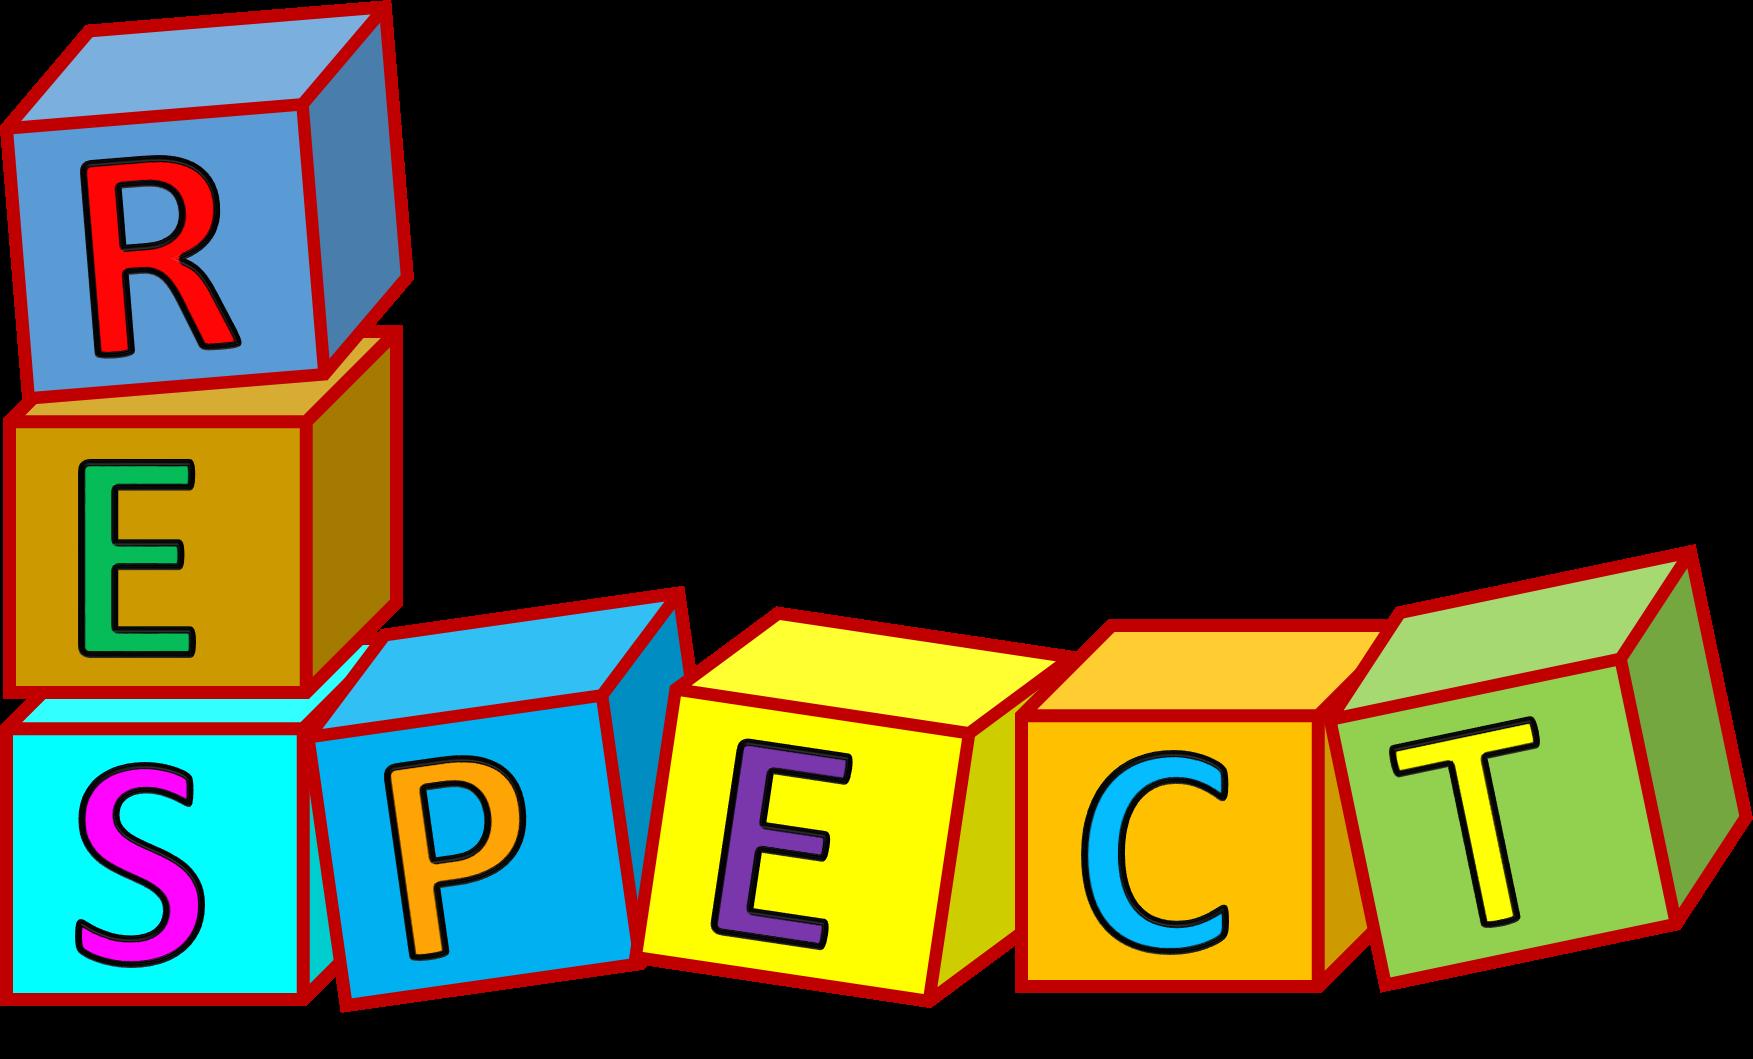 Free Respect Cliparts, Download Free Clip Art, Free Clip Art.